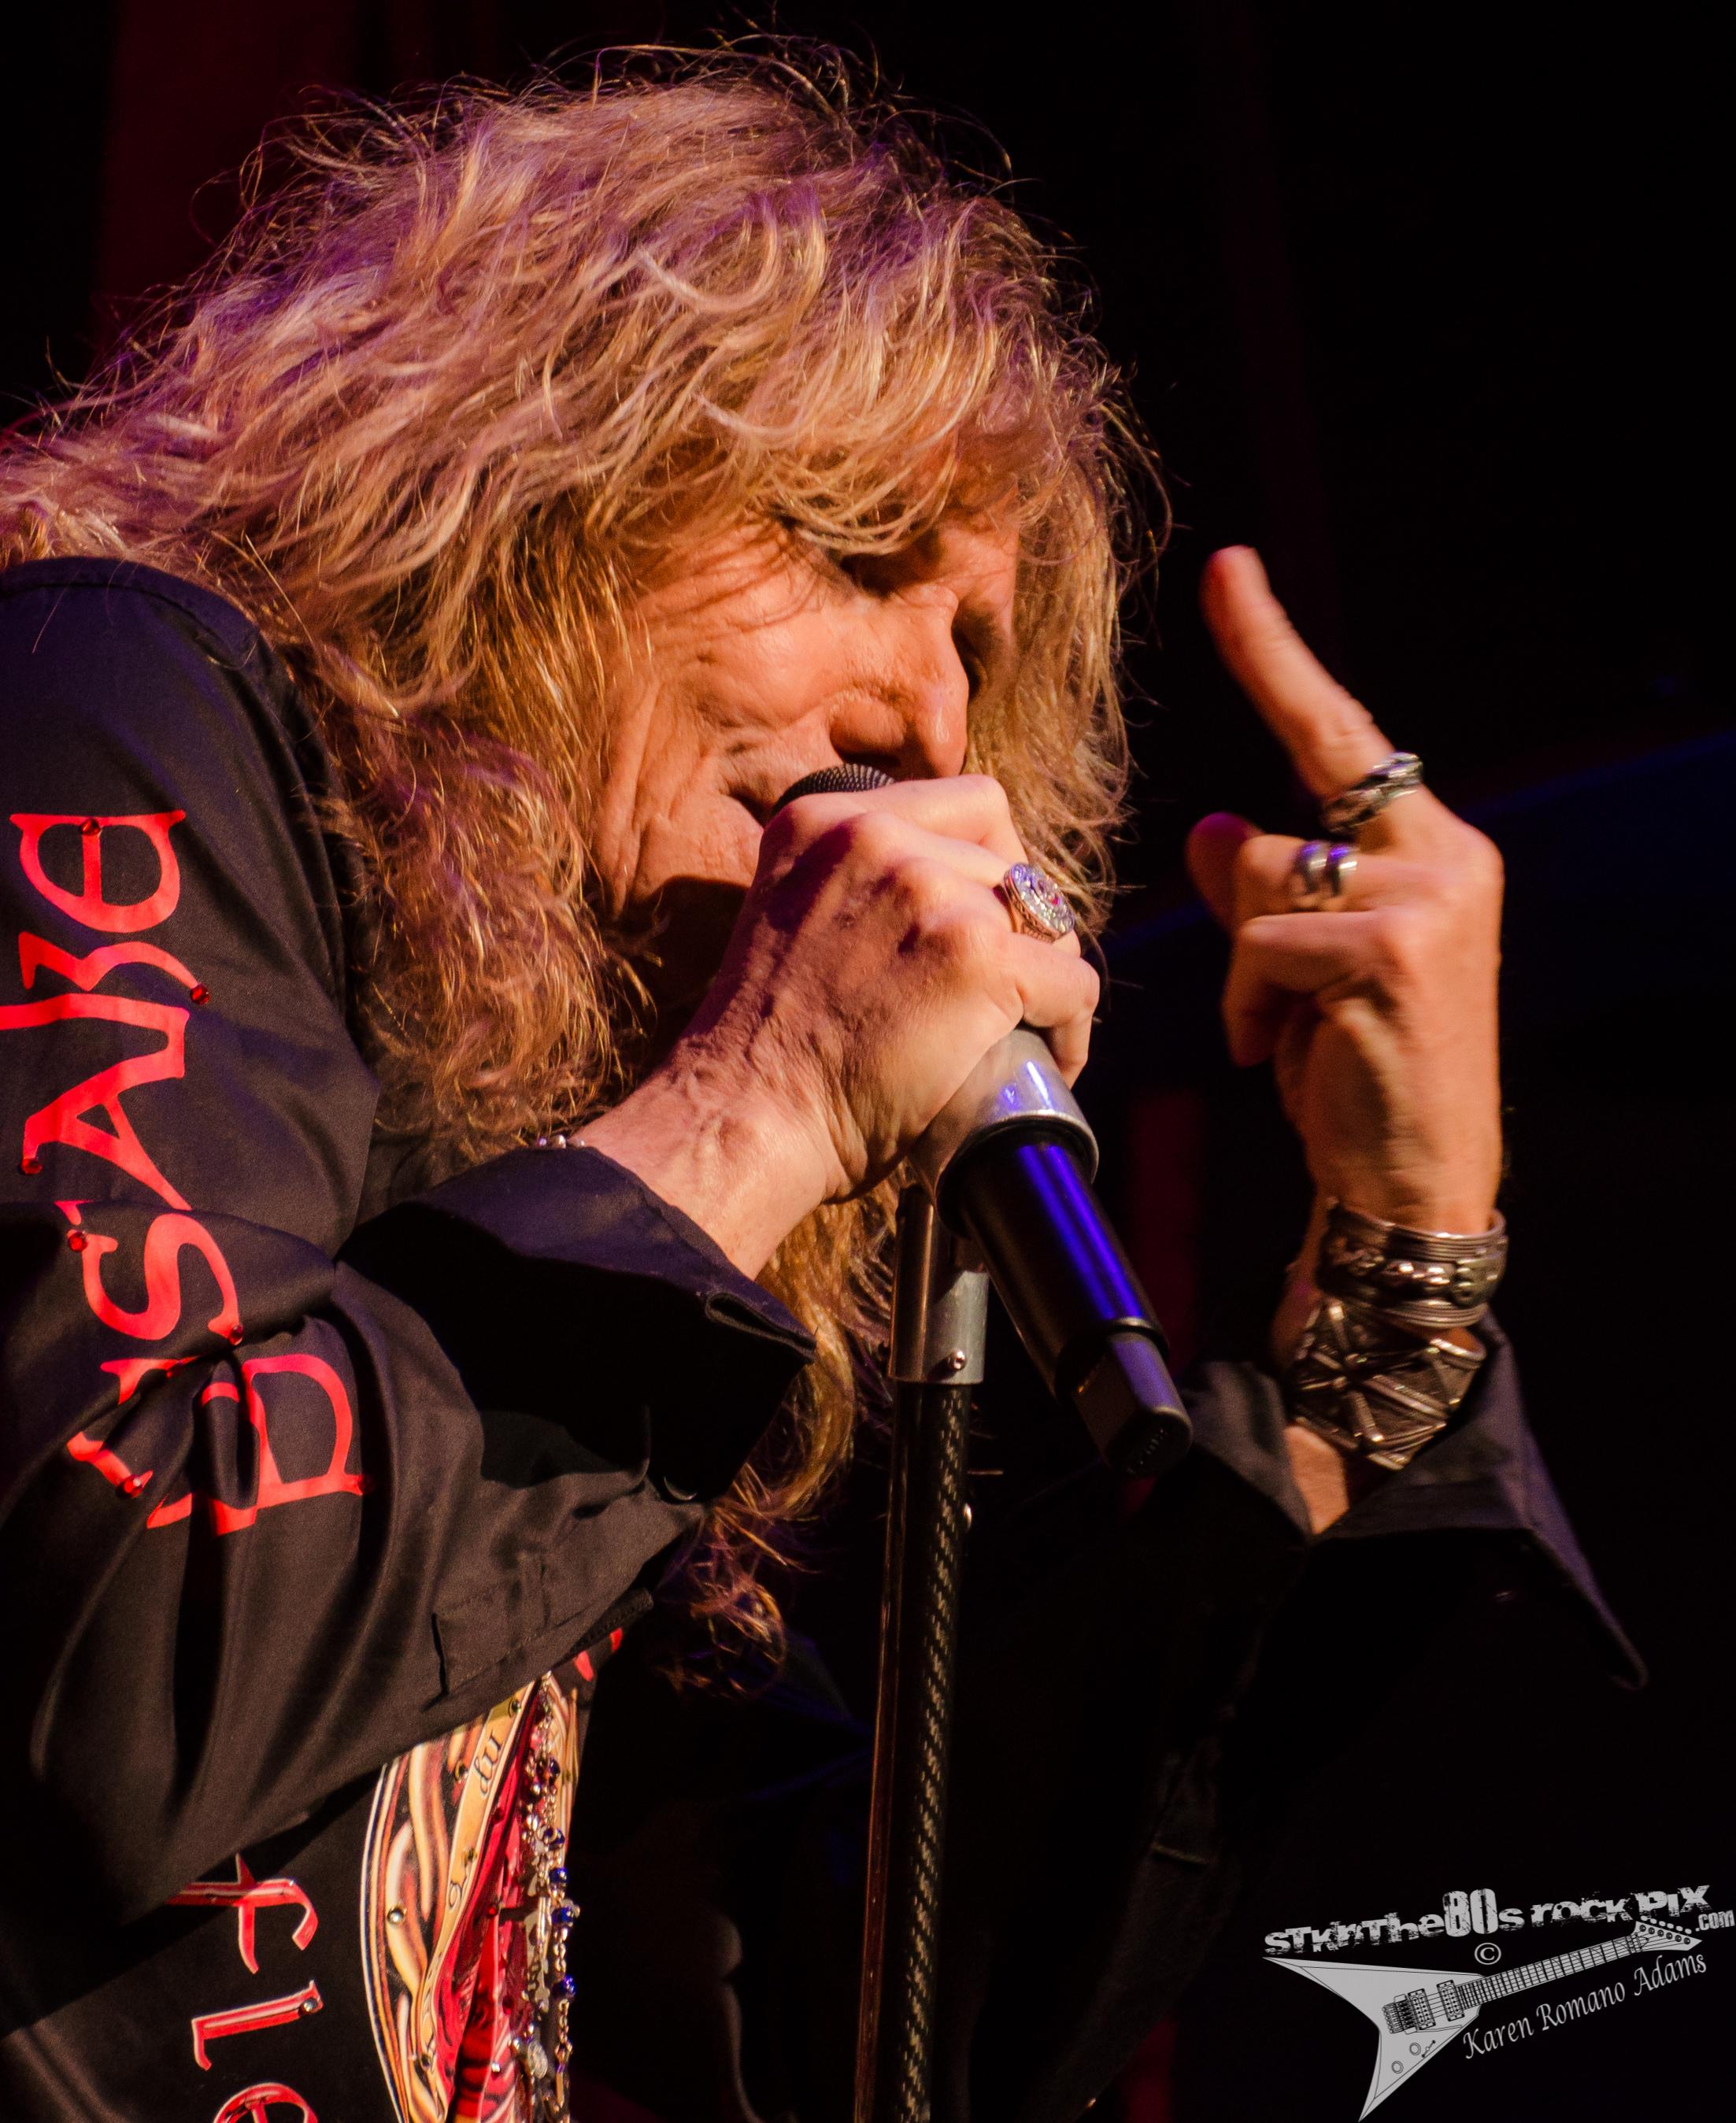 Whitesnake at Hard Rock Live 4-19-11